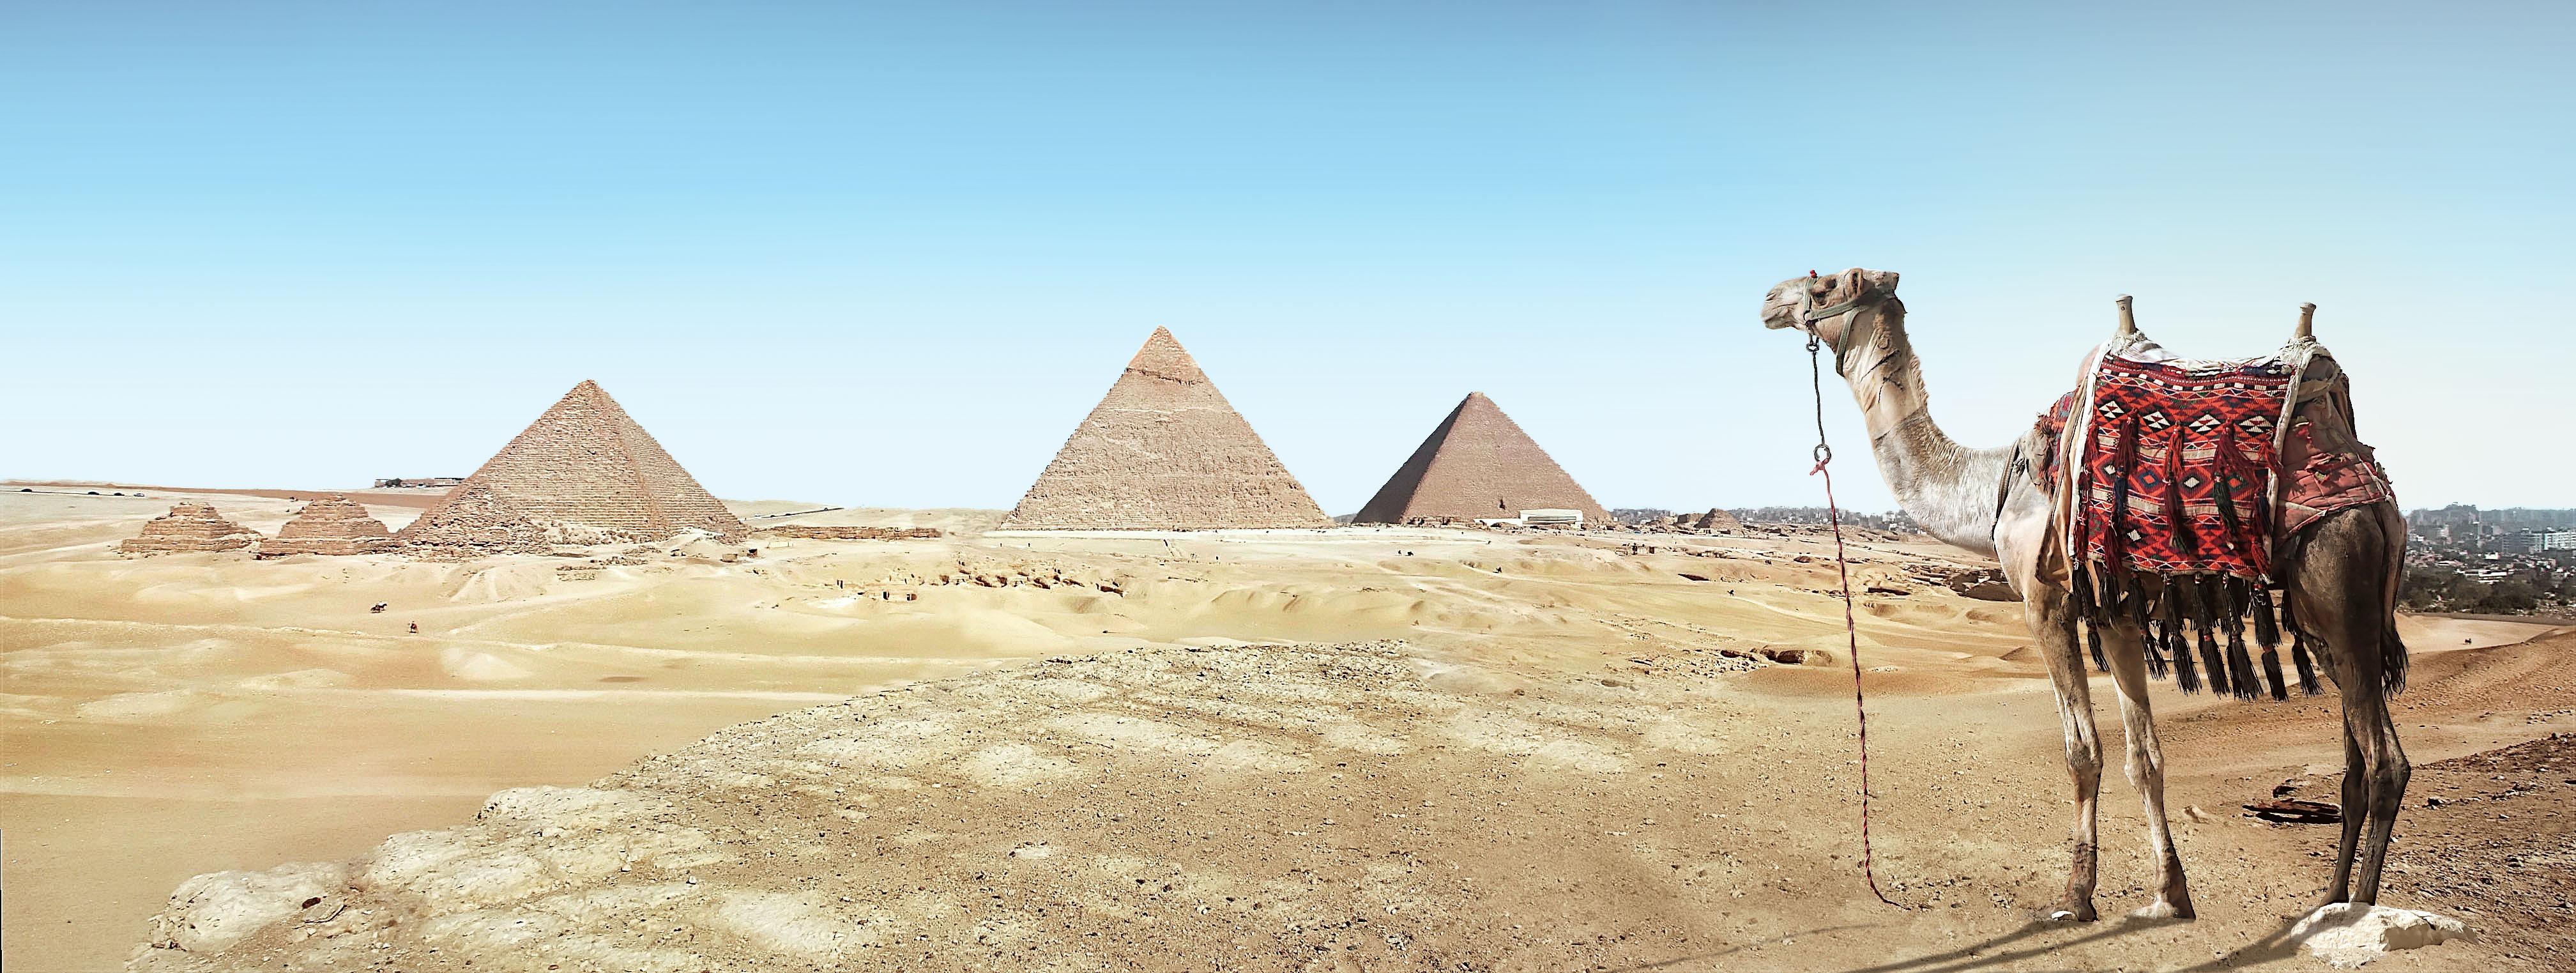 Gambar Pemandangan Pasir Gurun Monumen Unta Piramida Tengara